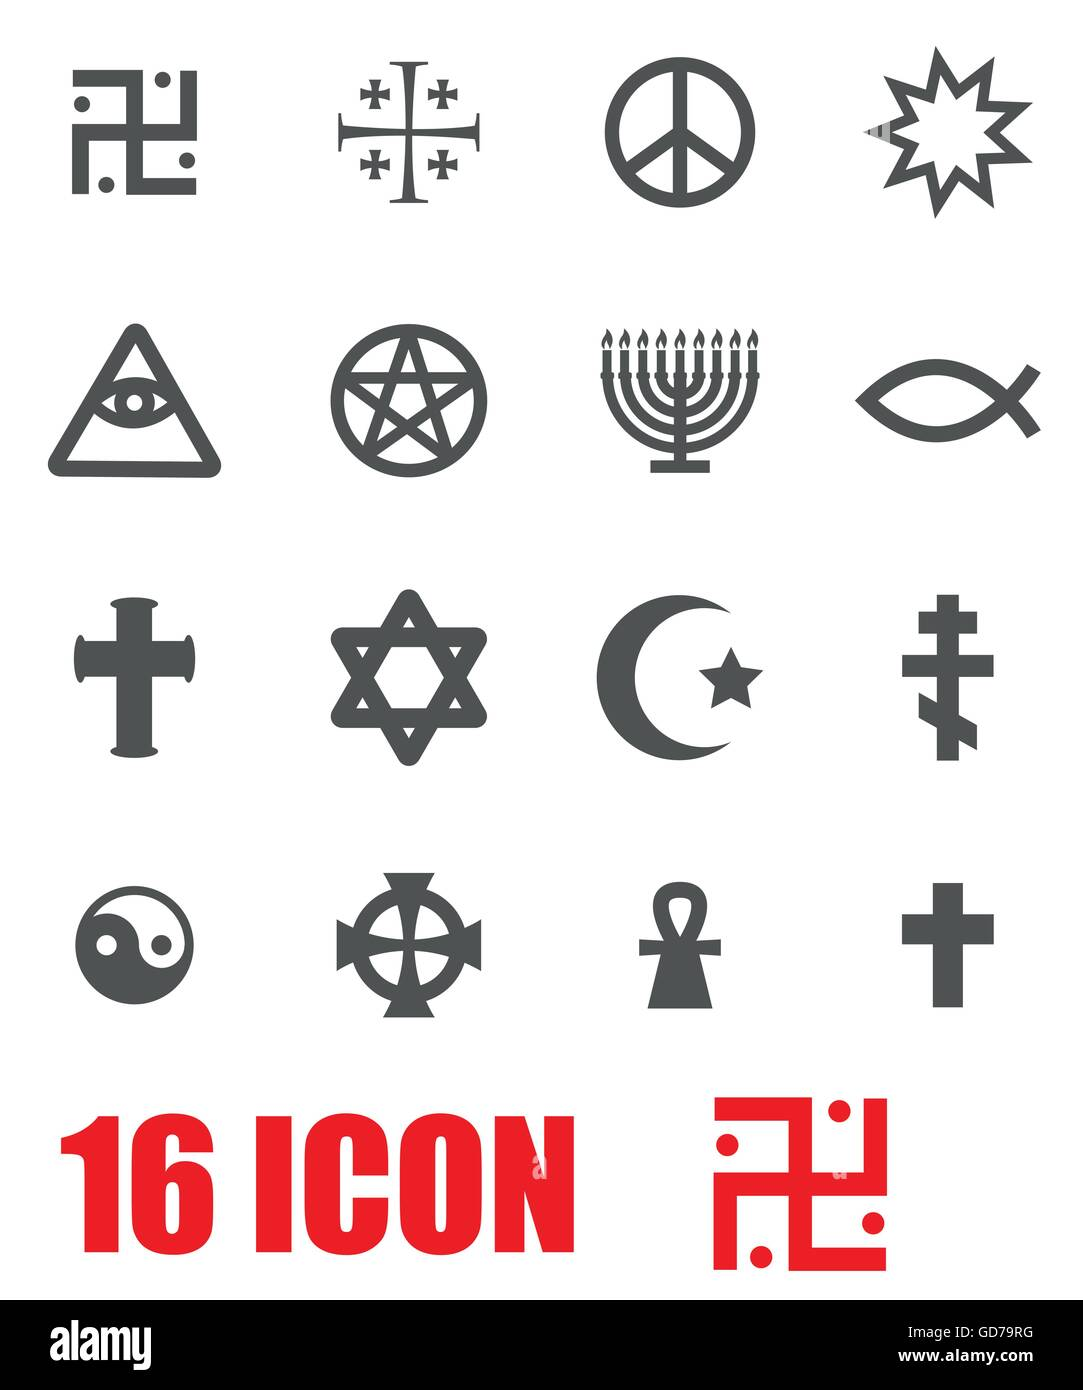 Vector Grey Religious Symbols Set Stock Vector Art Illustration